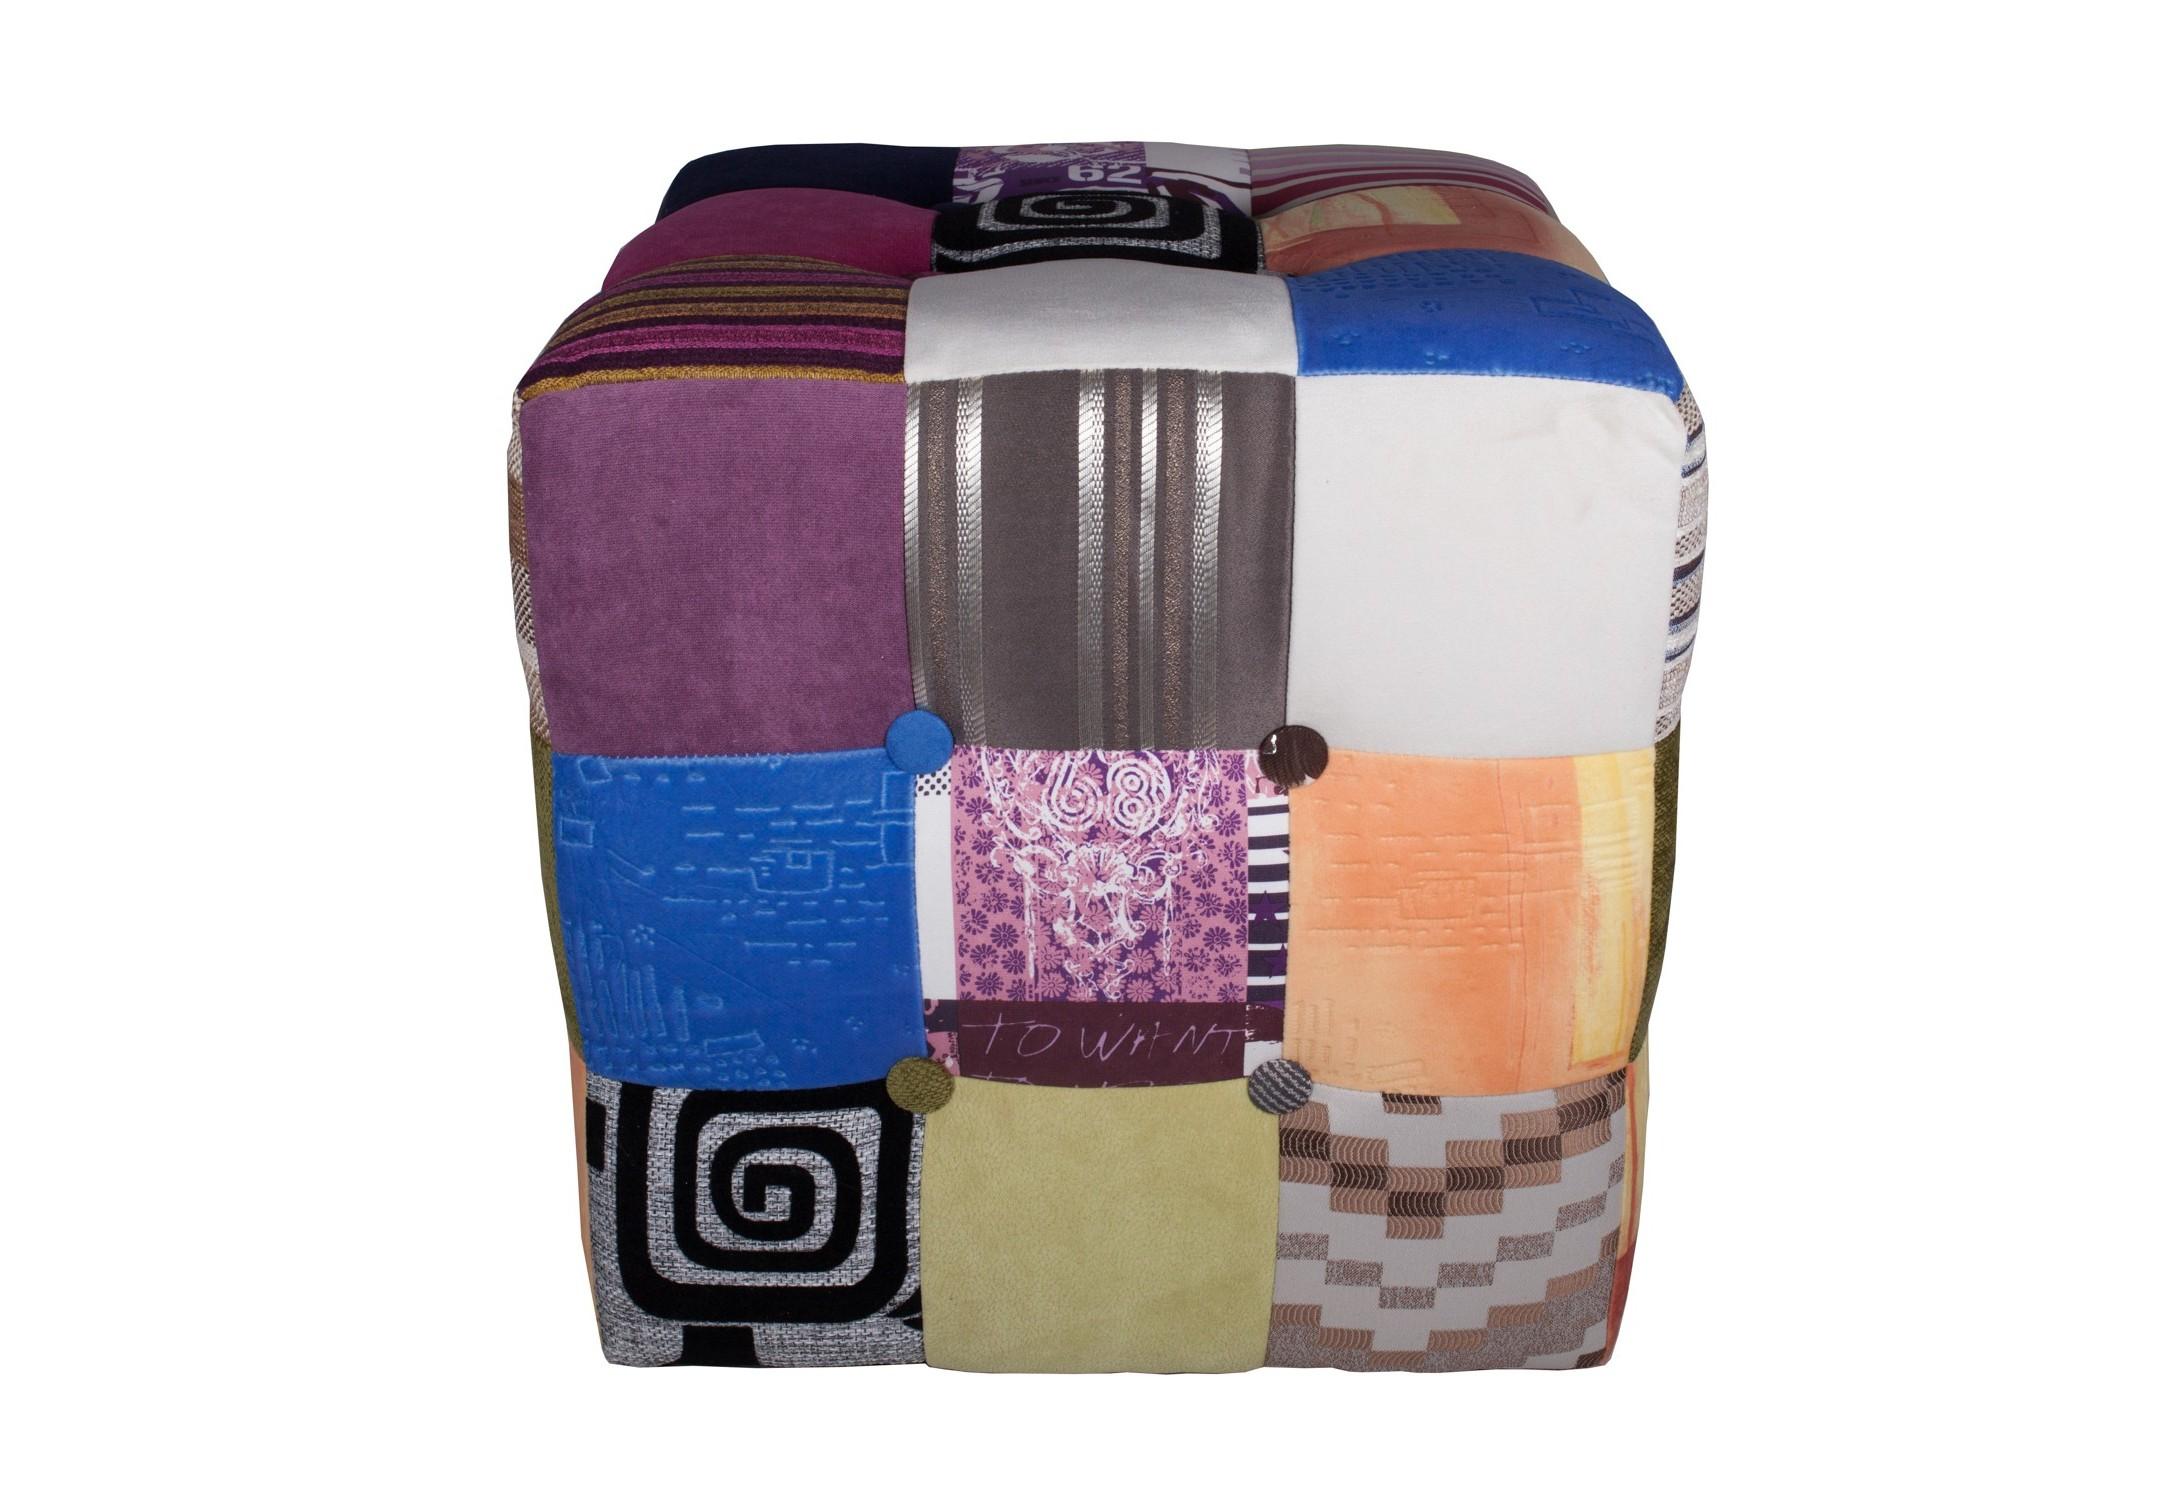 Пуф Patchwork ColorsФорменные пуфы<br><br><br>Material: Текстиль<br>Width см: 41<br>Depth см: 41<br>Height см: 43